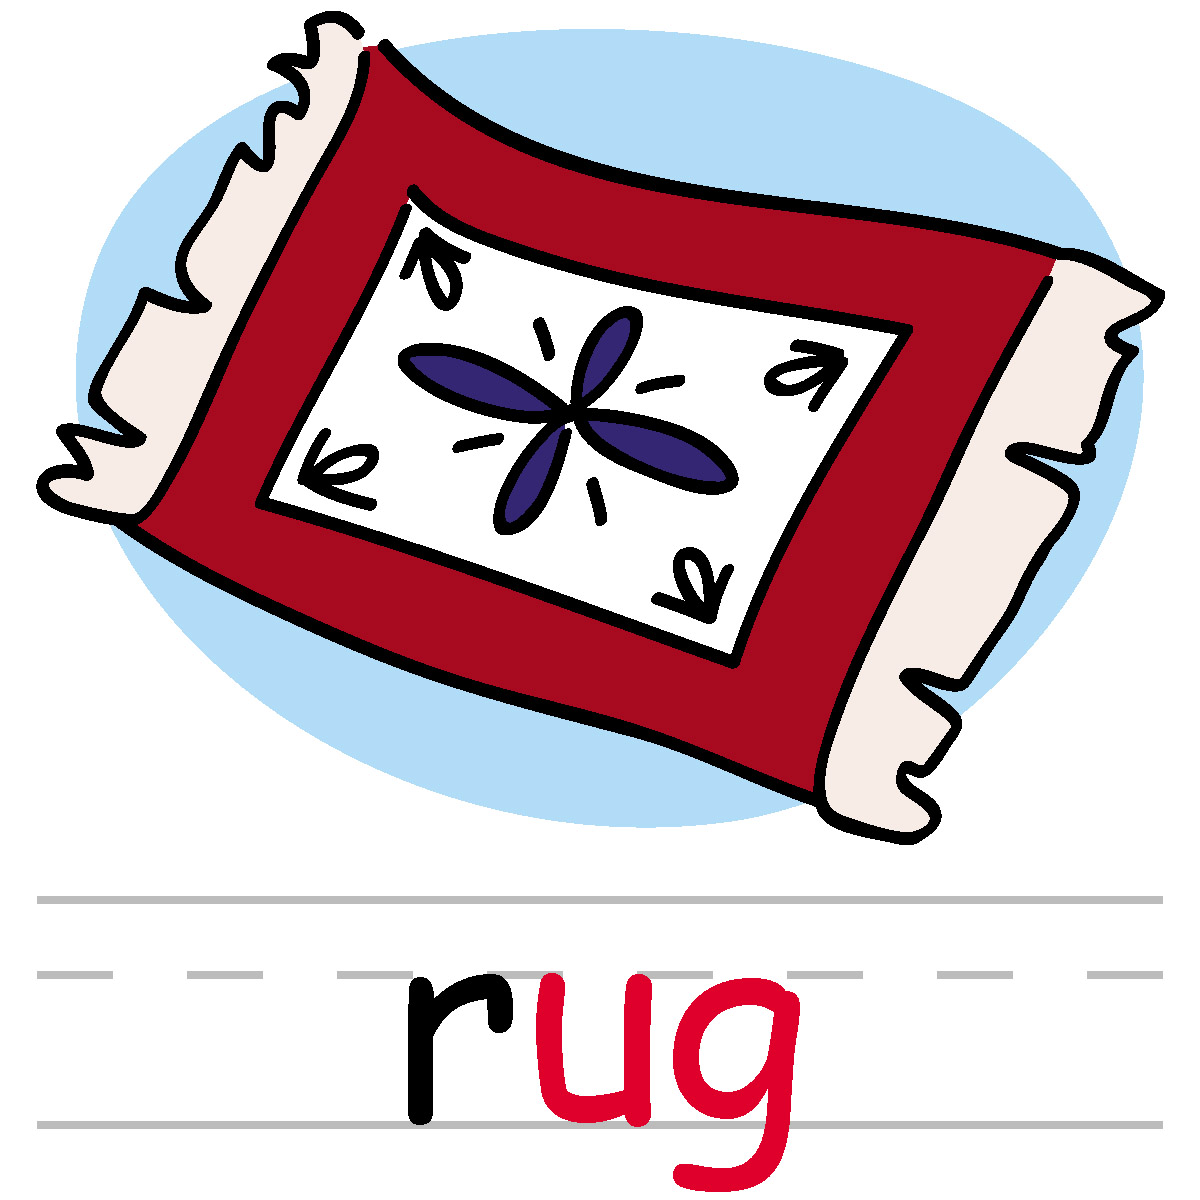 Red Carpet VIP Carpet Clipart.